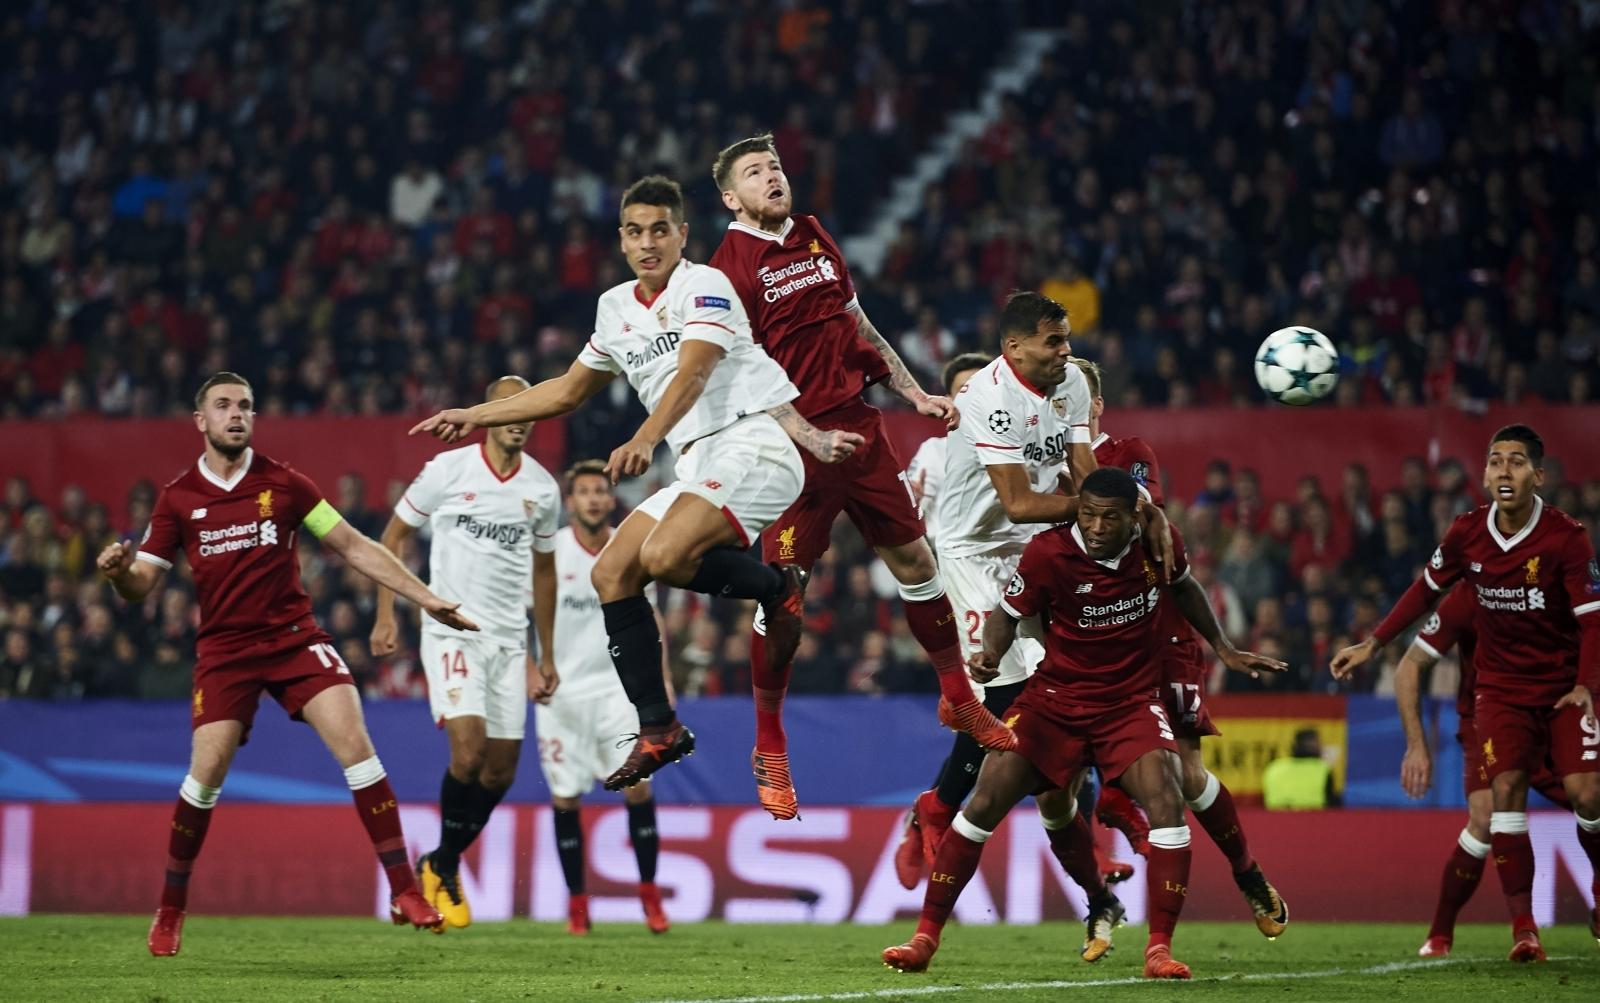 Sevilla vs Liverpool